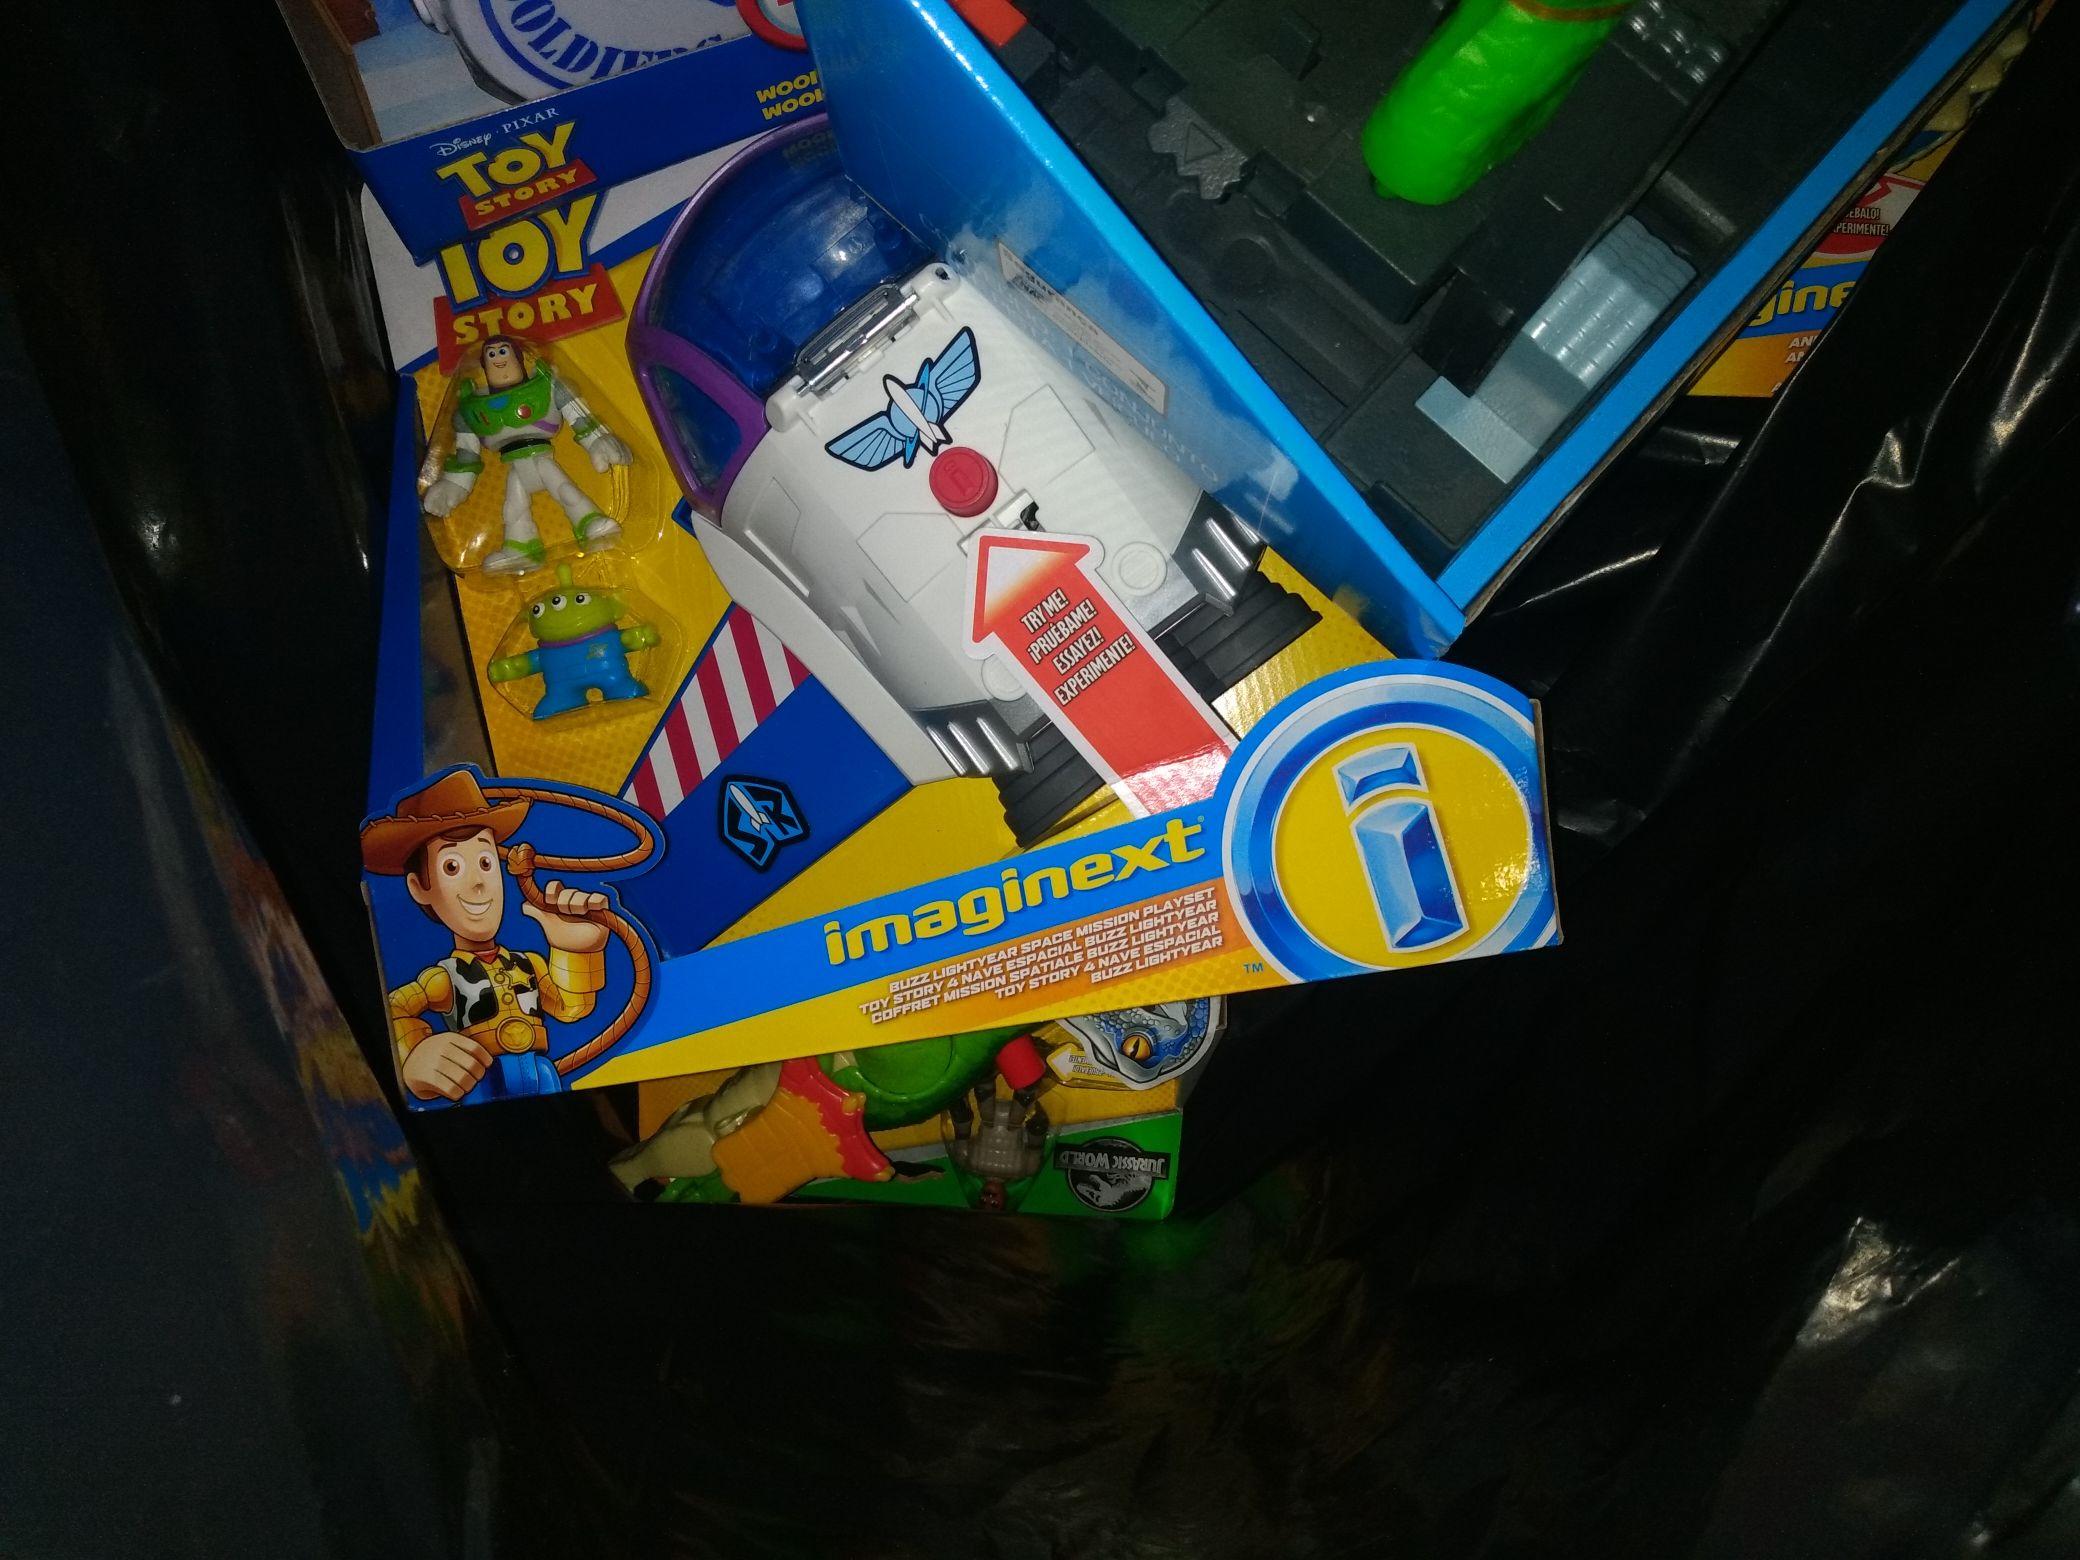 Bodega Aurrerá: varios juguetes